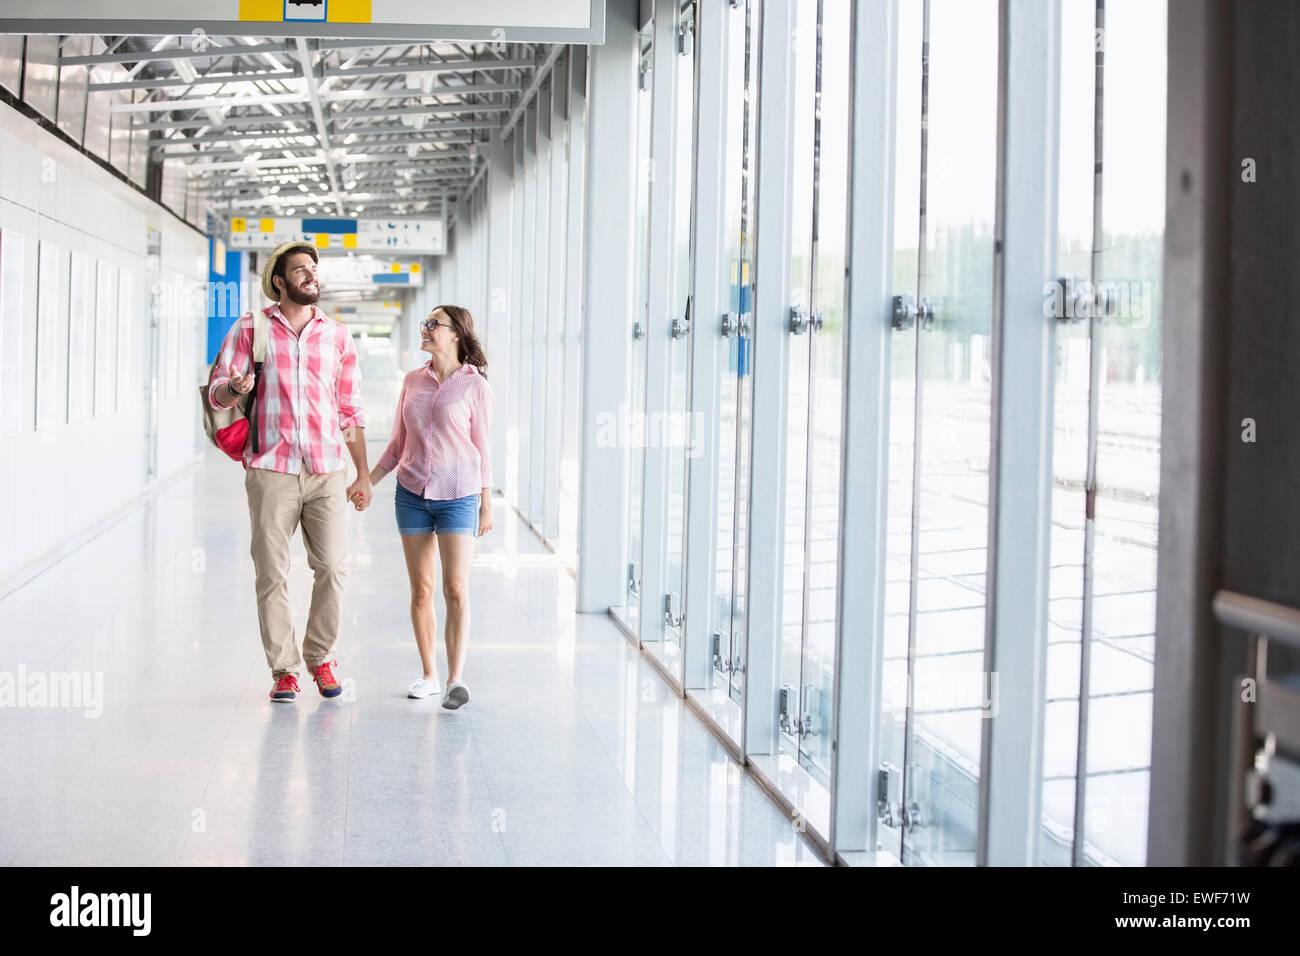 La longitud completa de la pareja caminando en pasaje cubierto Foto de stock